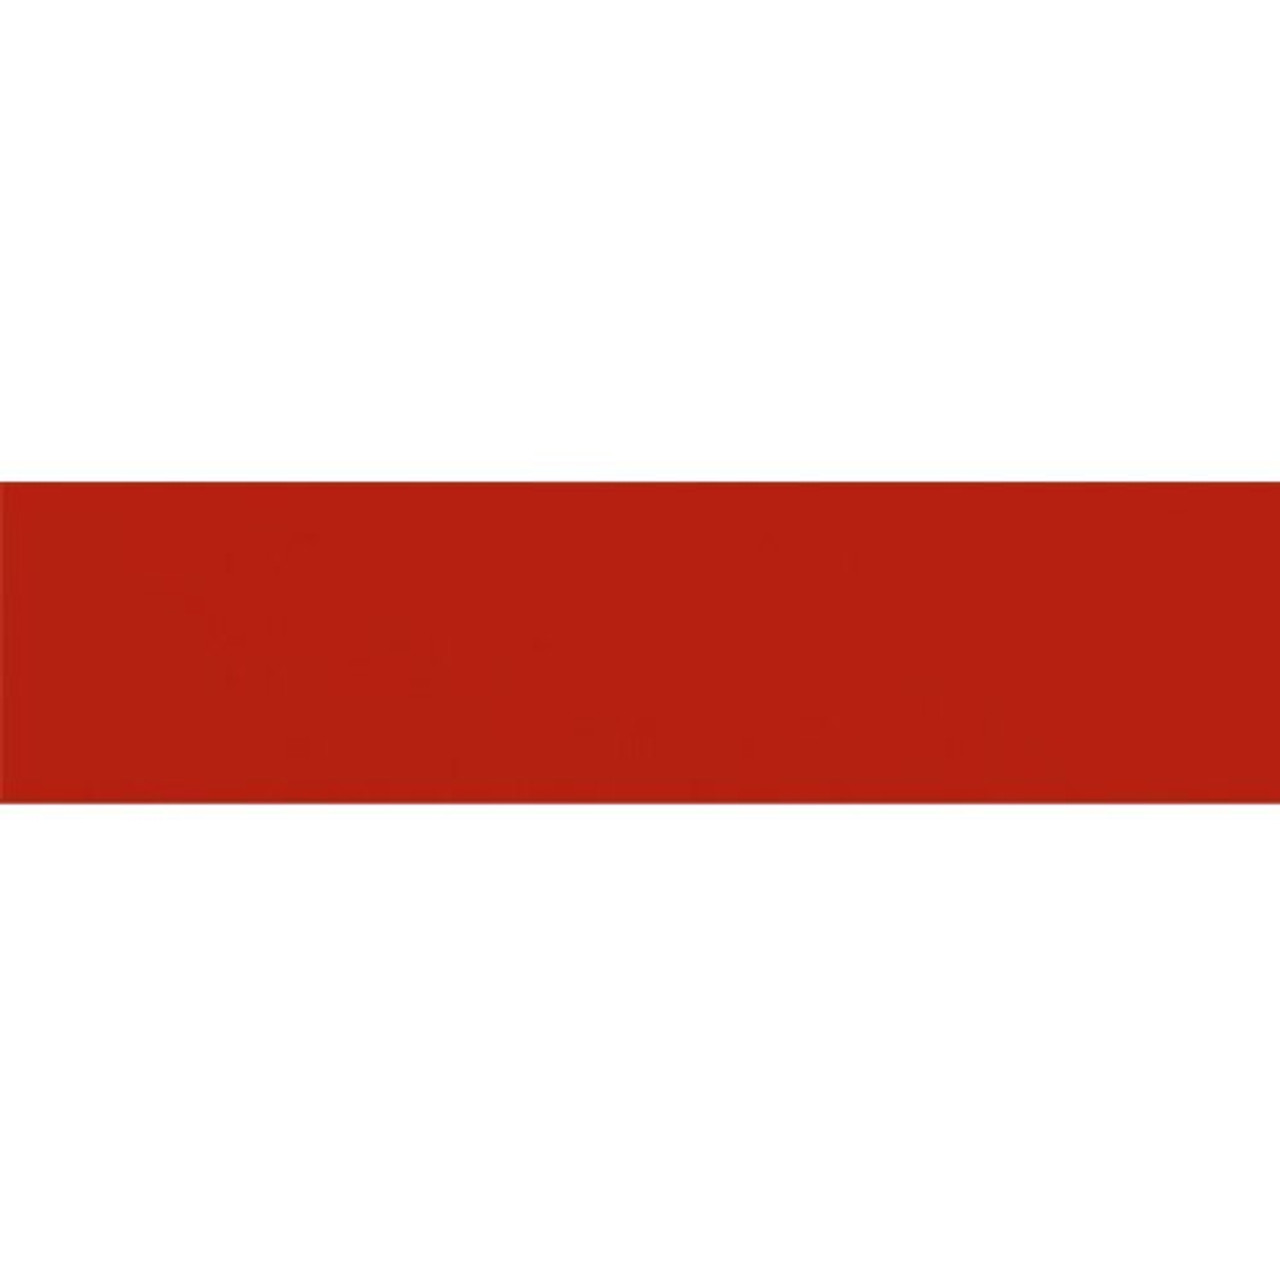 BELK Tile 3 x 12 Ceramic Tile Red